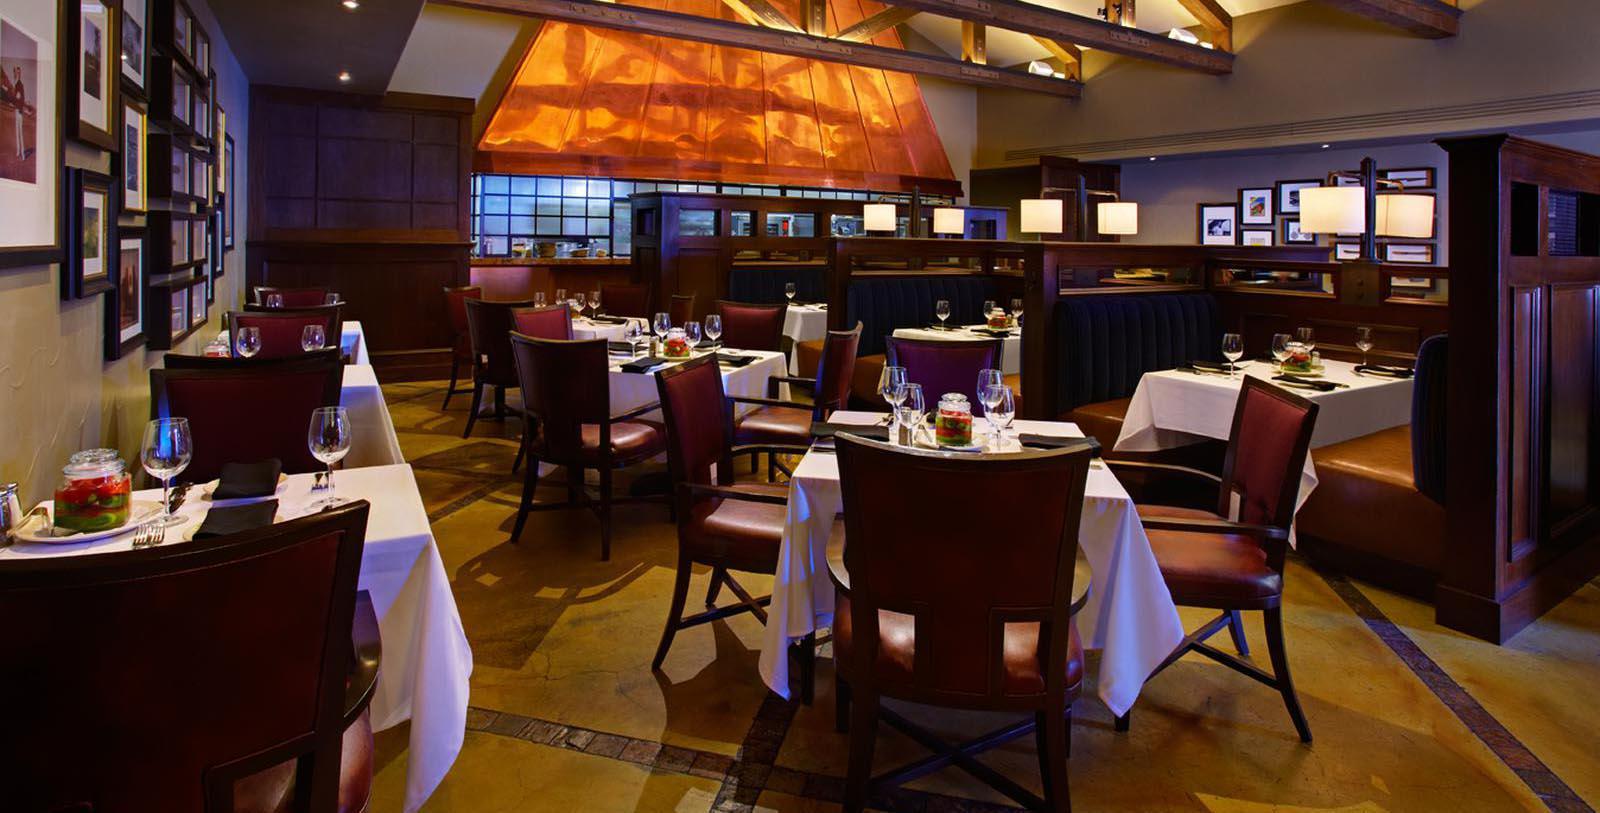 Image of Bob's Steak & Chop House, Omni La Costa Resort & Spa, Carlsbad, California, 1965, Member of Historic Hotels of America, Taste